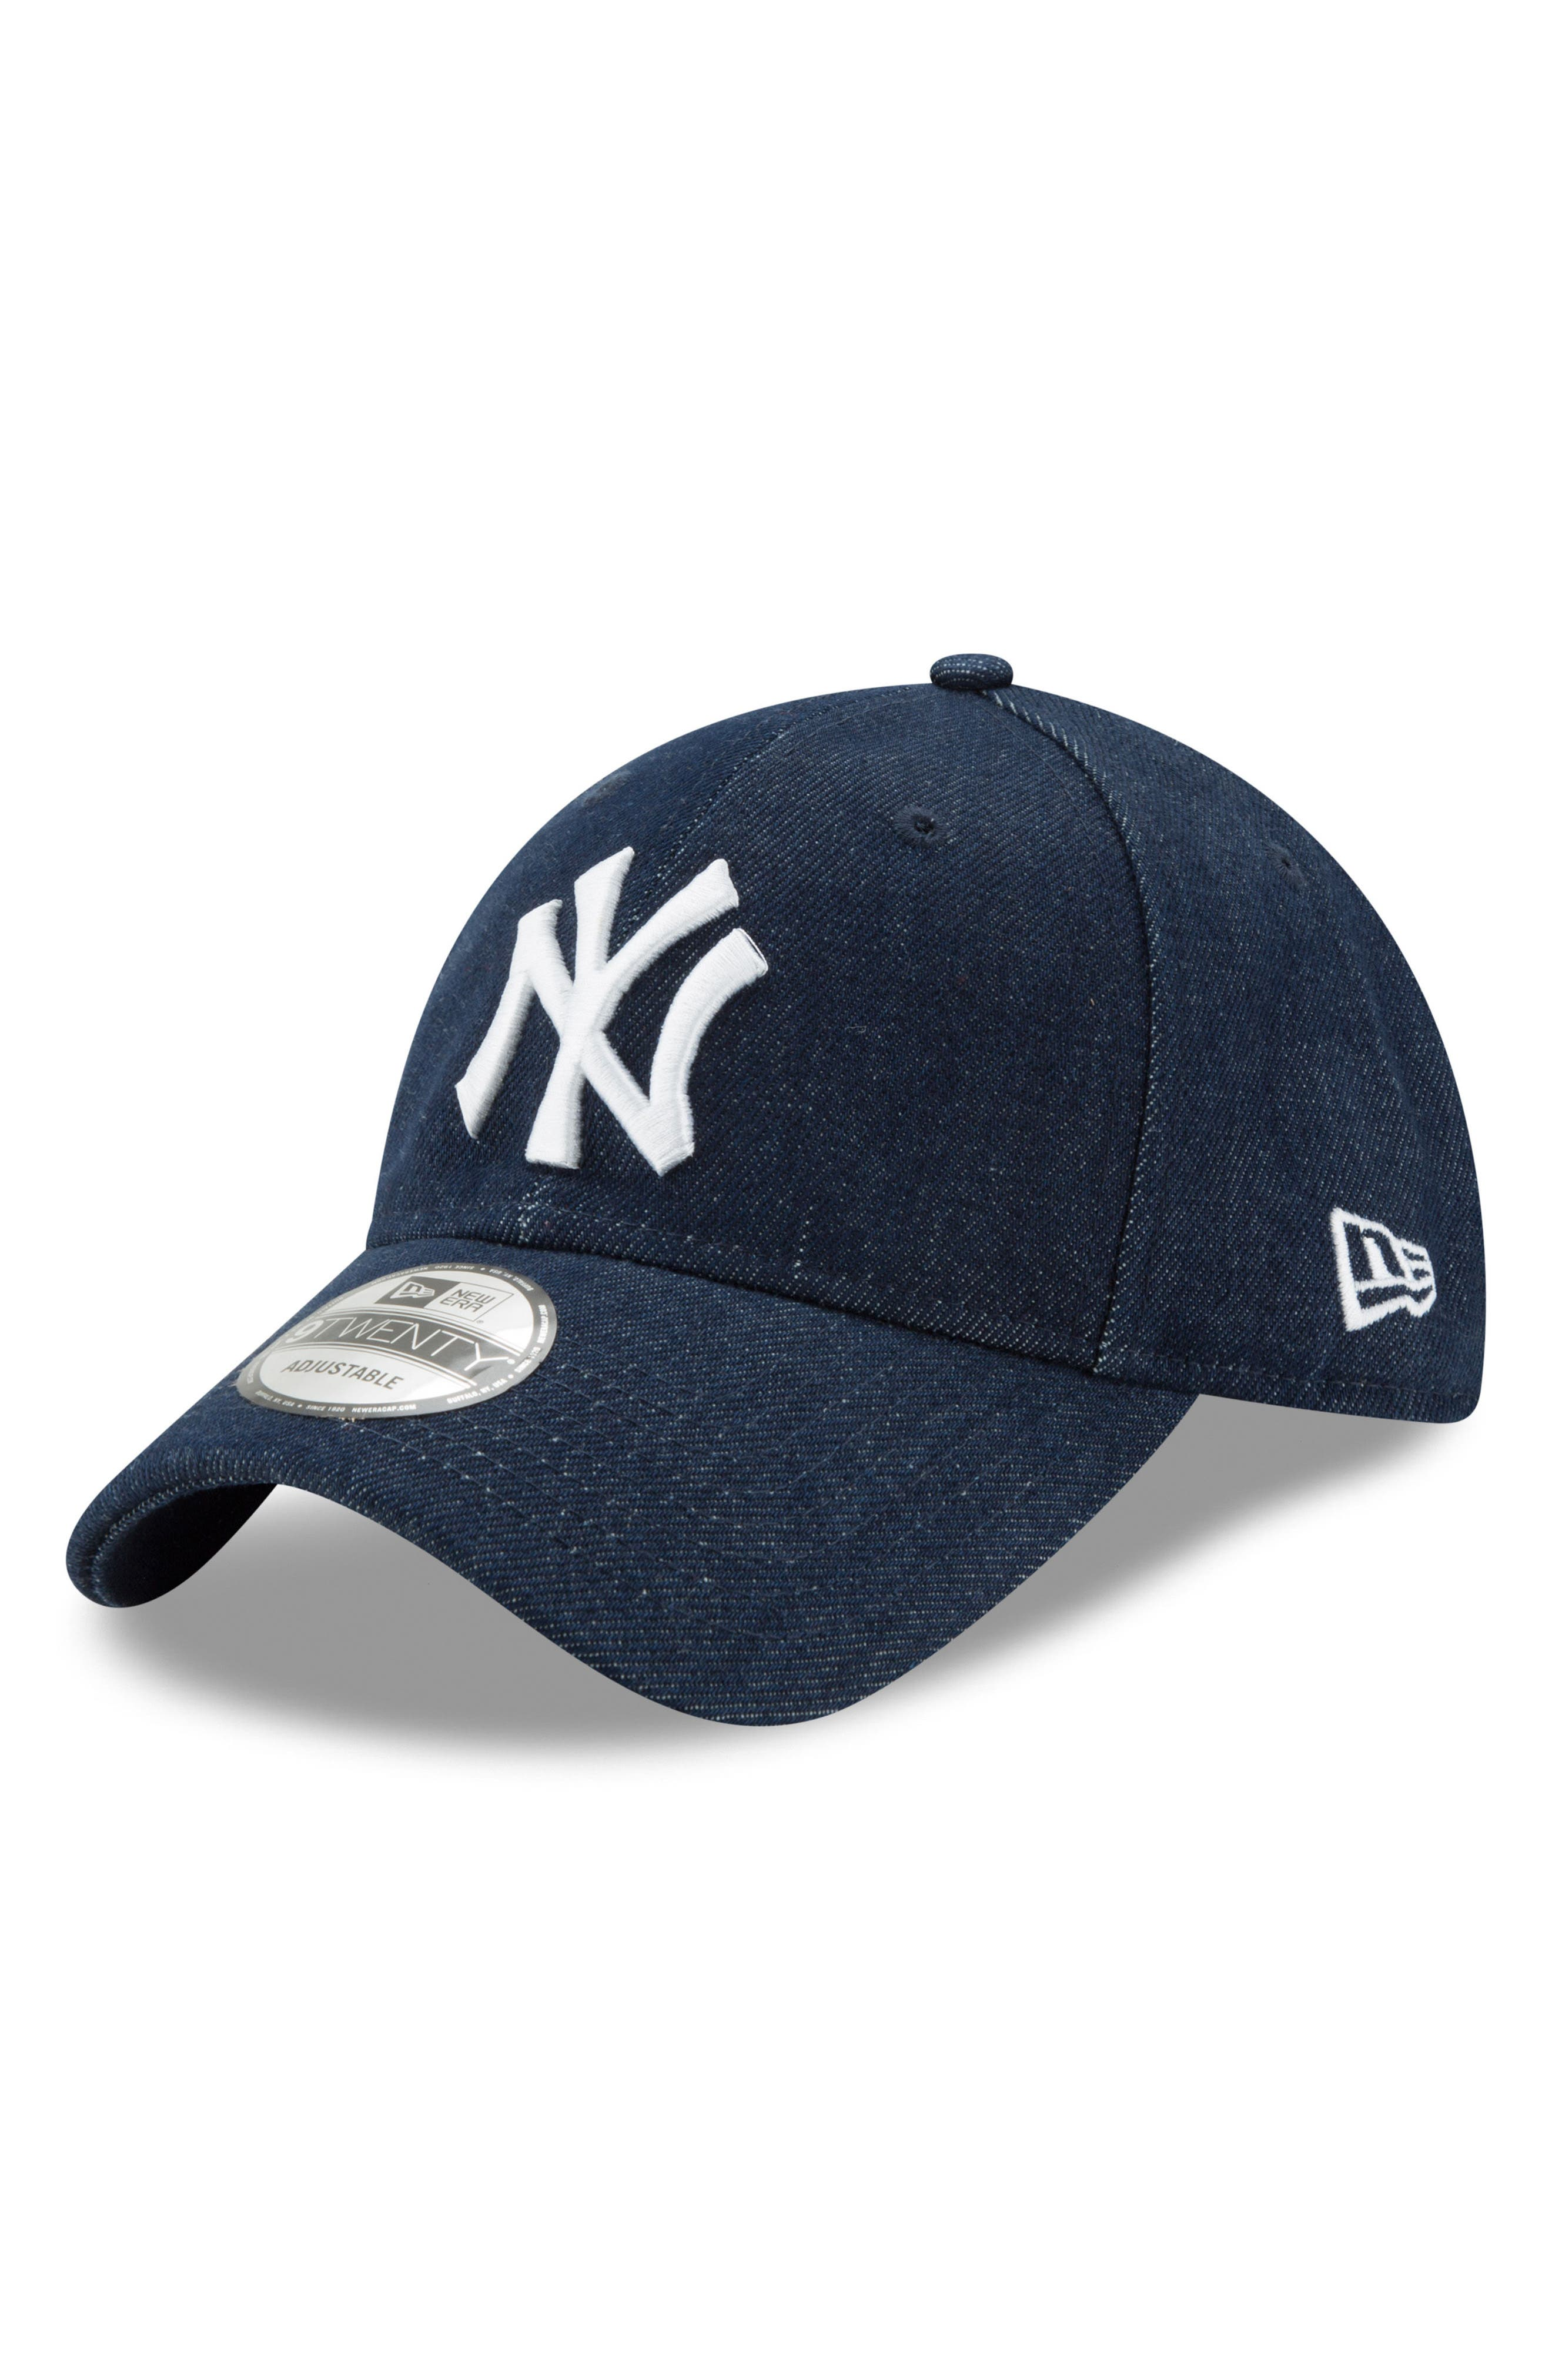 9d41fa4a856c ... york yankees panel splatter 59fifty fitted baseball cap new era mlb 1  974c3 94884; ebay new era cap x levis mlb17 denim baseball cap d0c25 69217